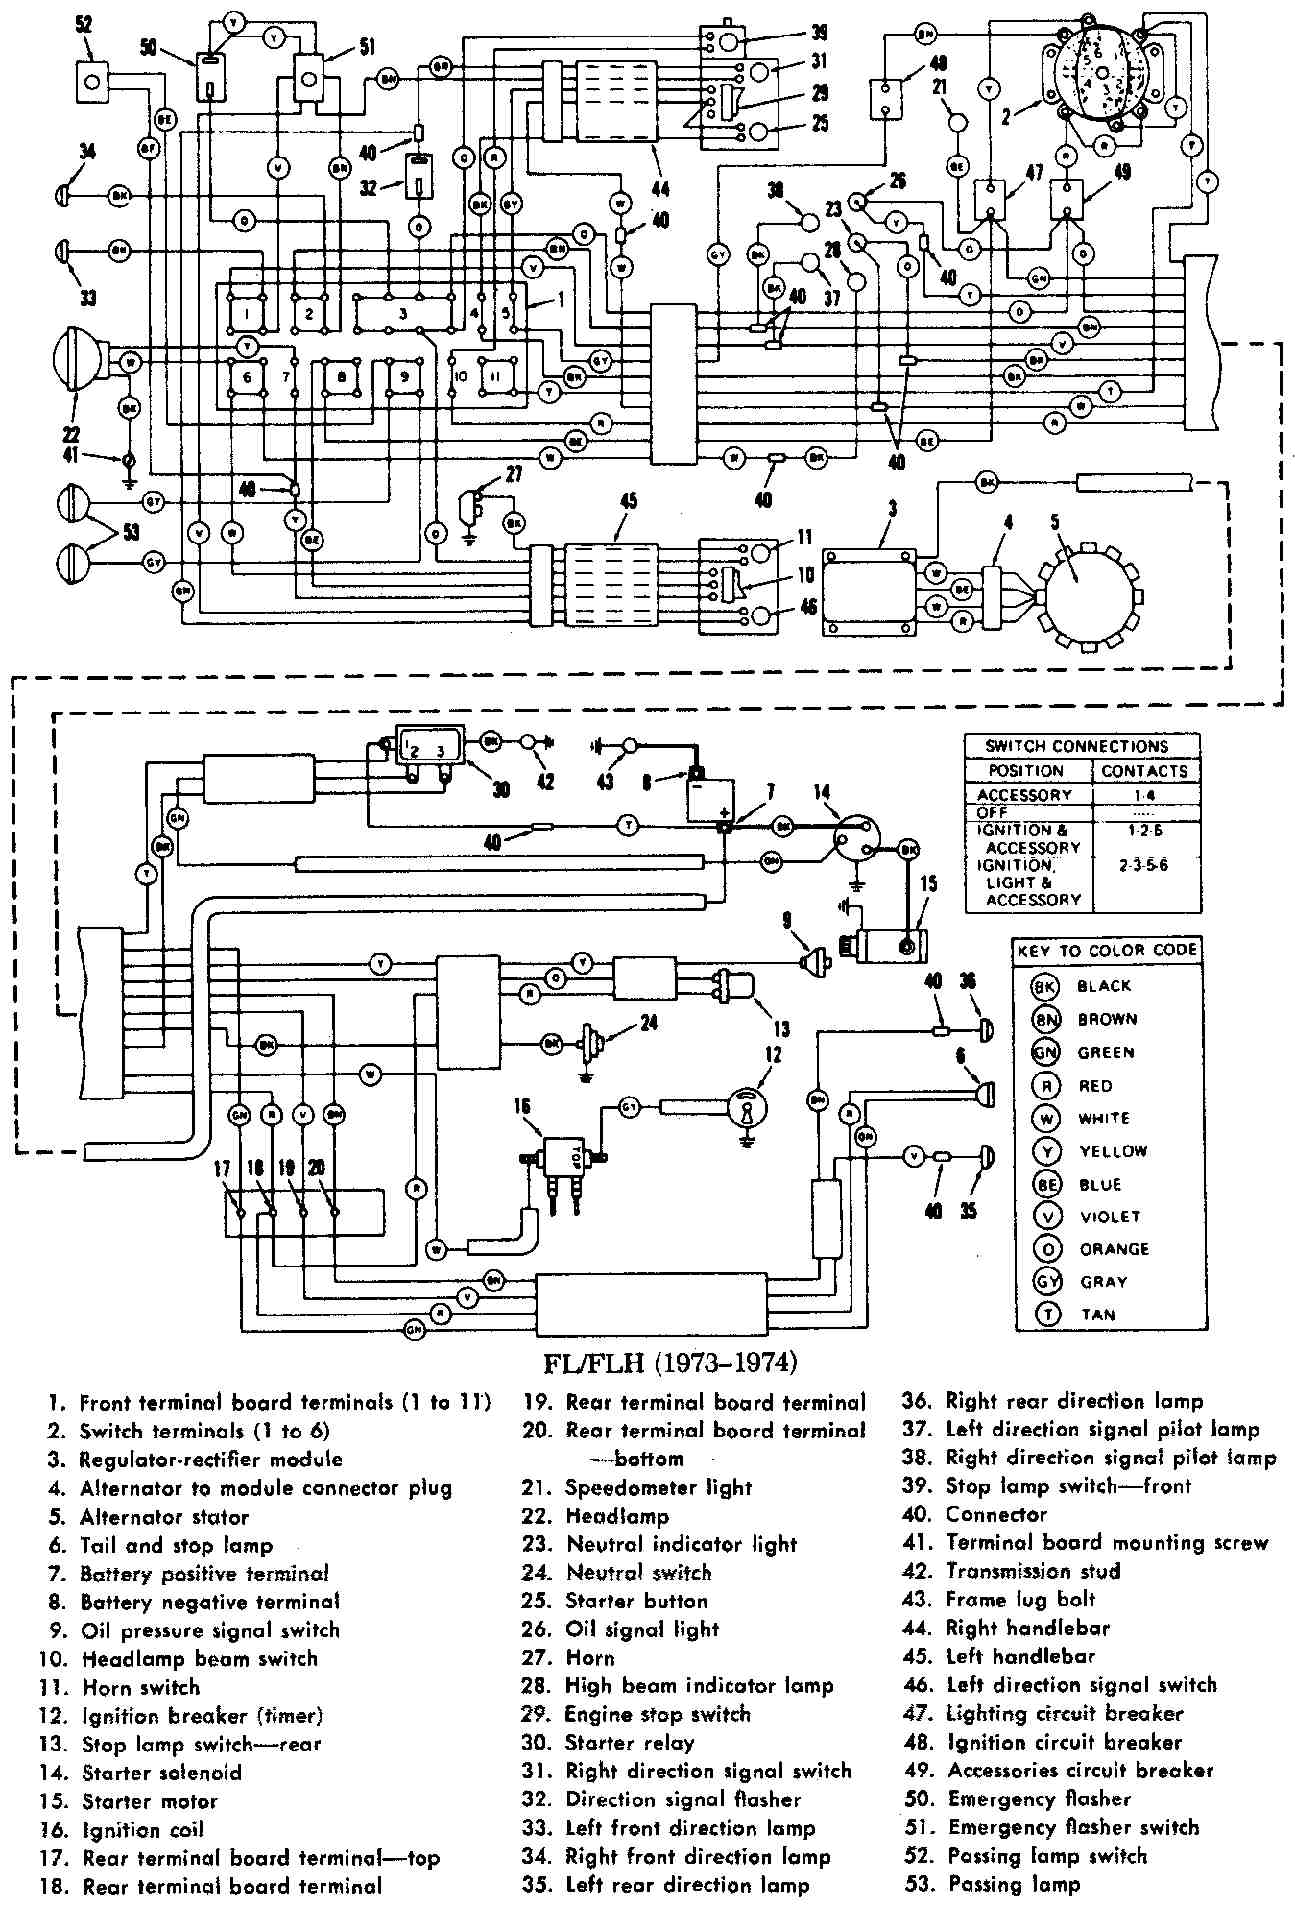 Snap Amc Amx Fuse Box Car Repair Manuals And Wiring Diagrams Photos For 1968 Starter Diagram Pontiac Fiero Elsavadorla